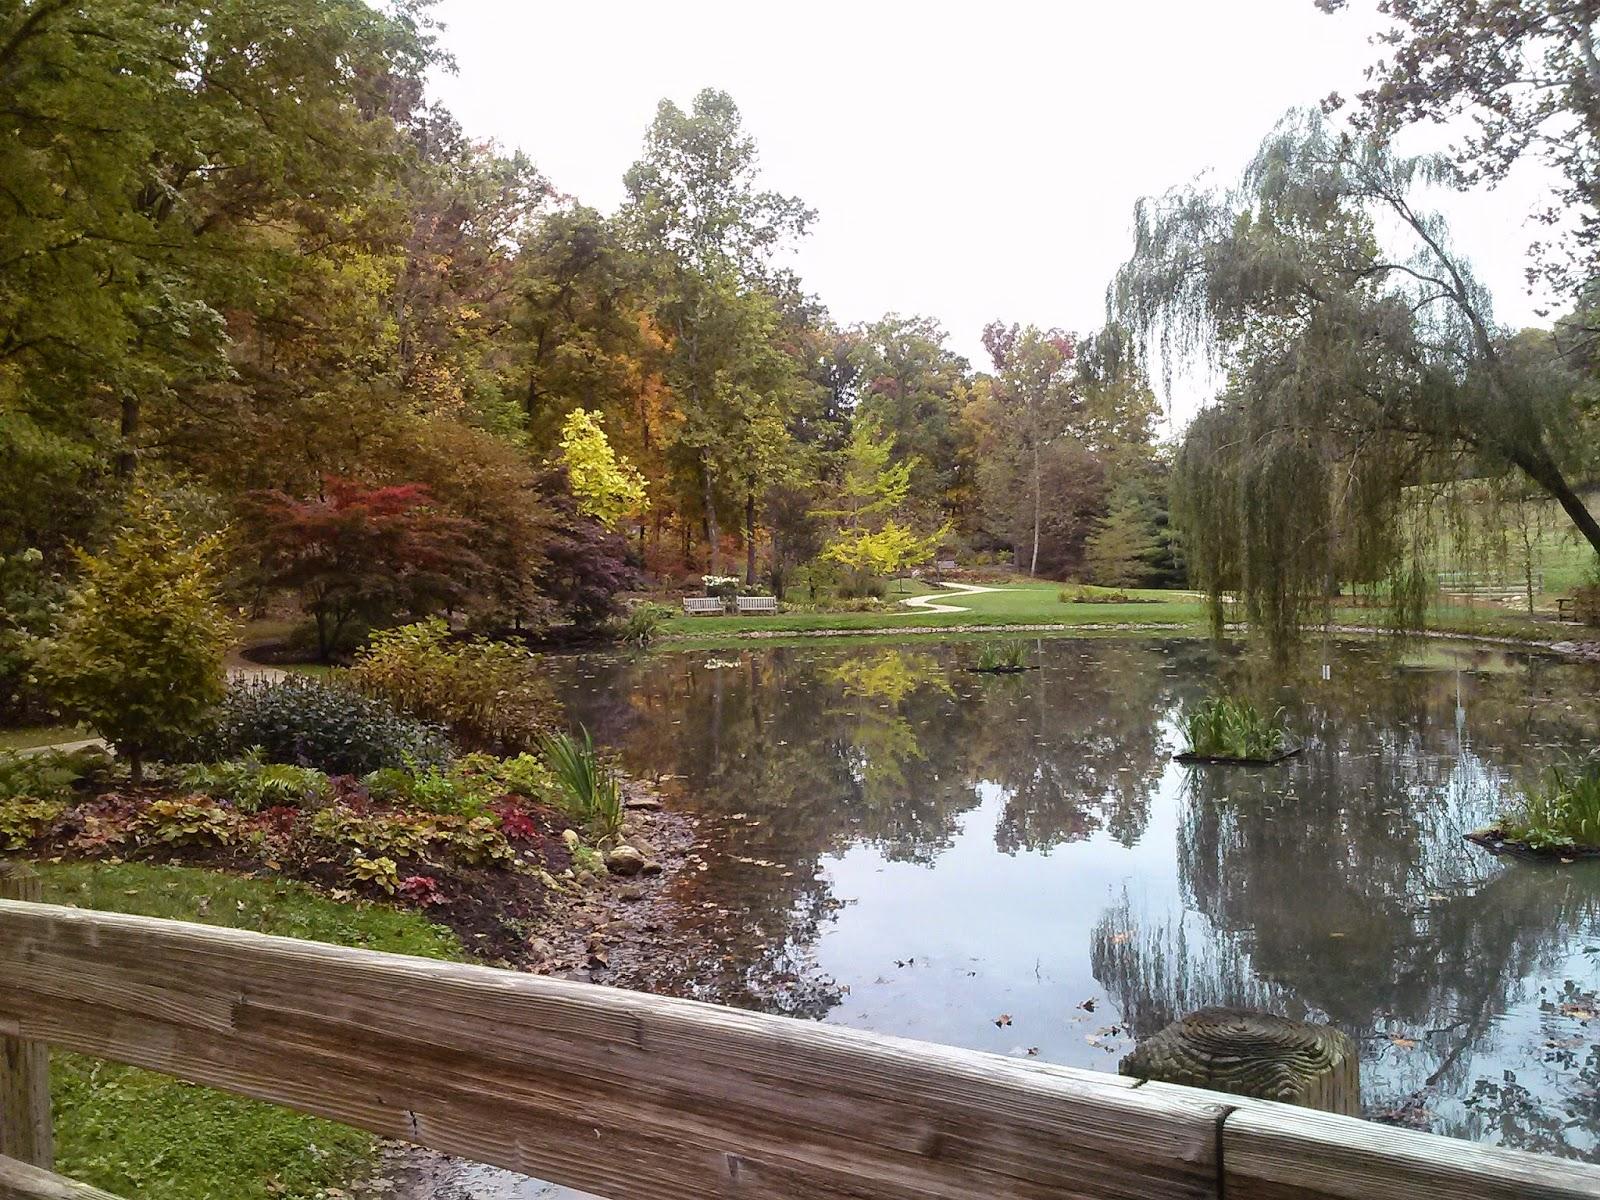 Edith J. Carrier Arboretum and Botanical Gardens in Harrisonburg, Virginia  l  Love.Bake.Read